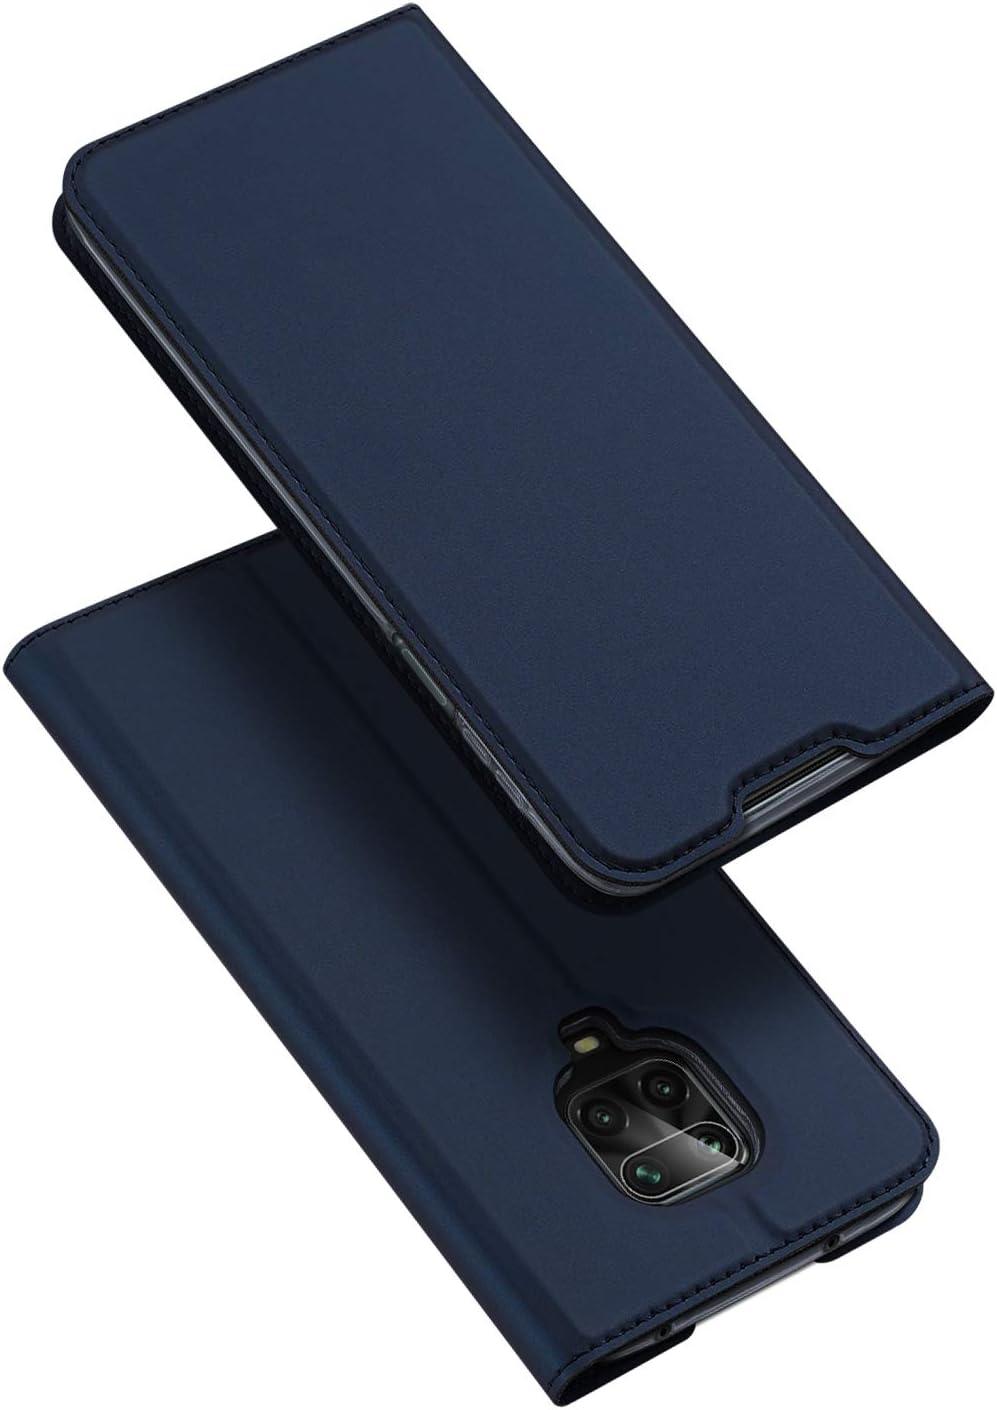 DUX DUCIS Funda Redmi Note 9S, Redmi Note 9 Pro Funda, PU Cuero Flip Carcasa Fundas Móvil de Tapa Libro para Xiaomi Redmi Note 9S / Note 9 Pro (Azul Marino)